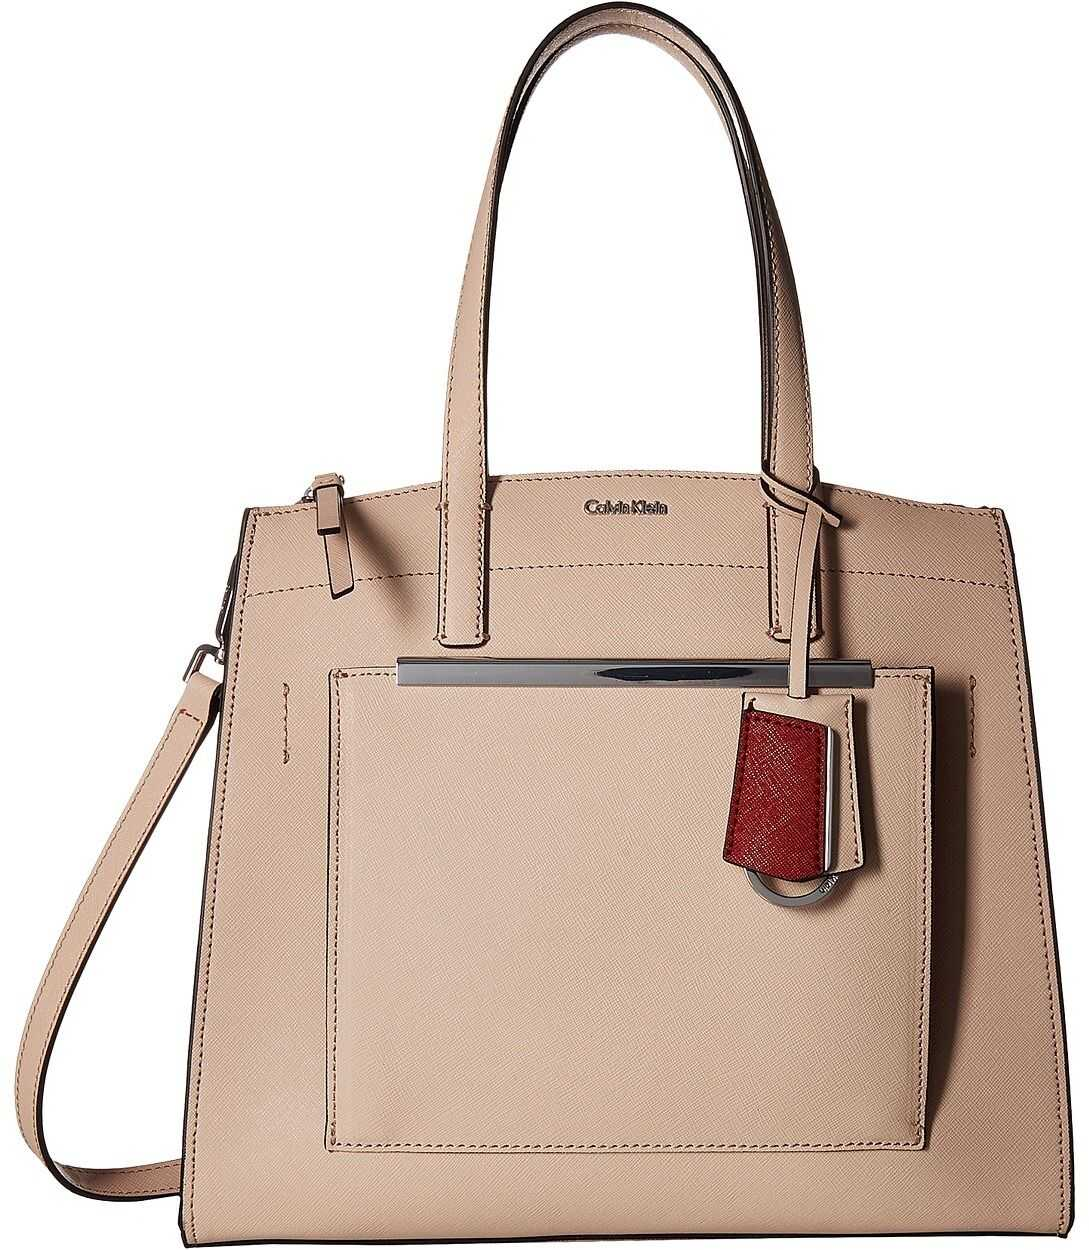 Calvin Klein Mara Saffiano Leather Satchel Desert Taupe